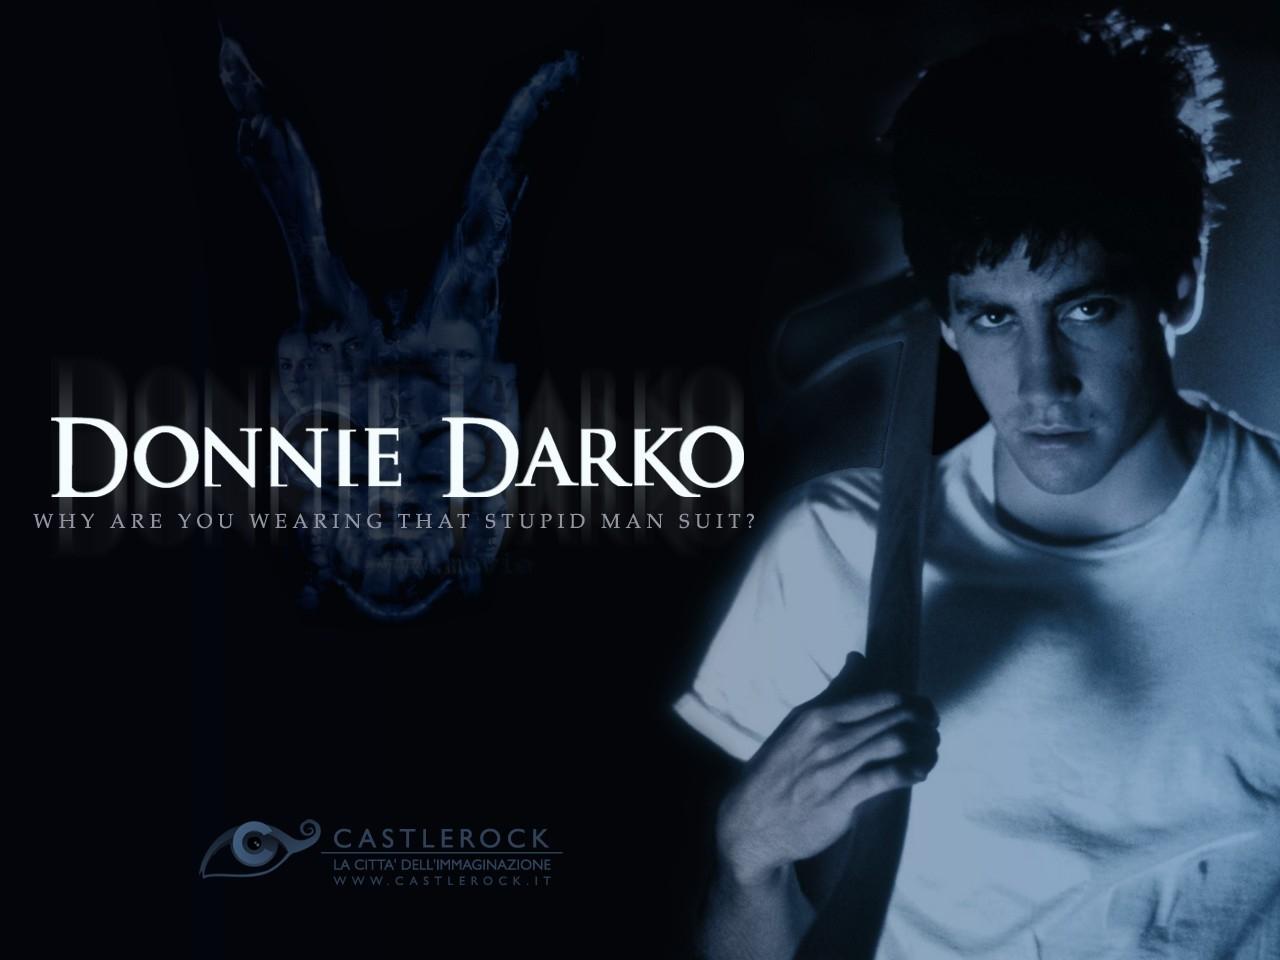 Wallpaper del film Donnie Darko con Jake Gyllenhaal